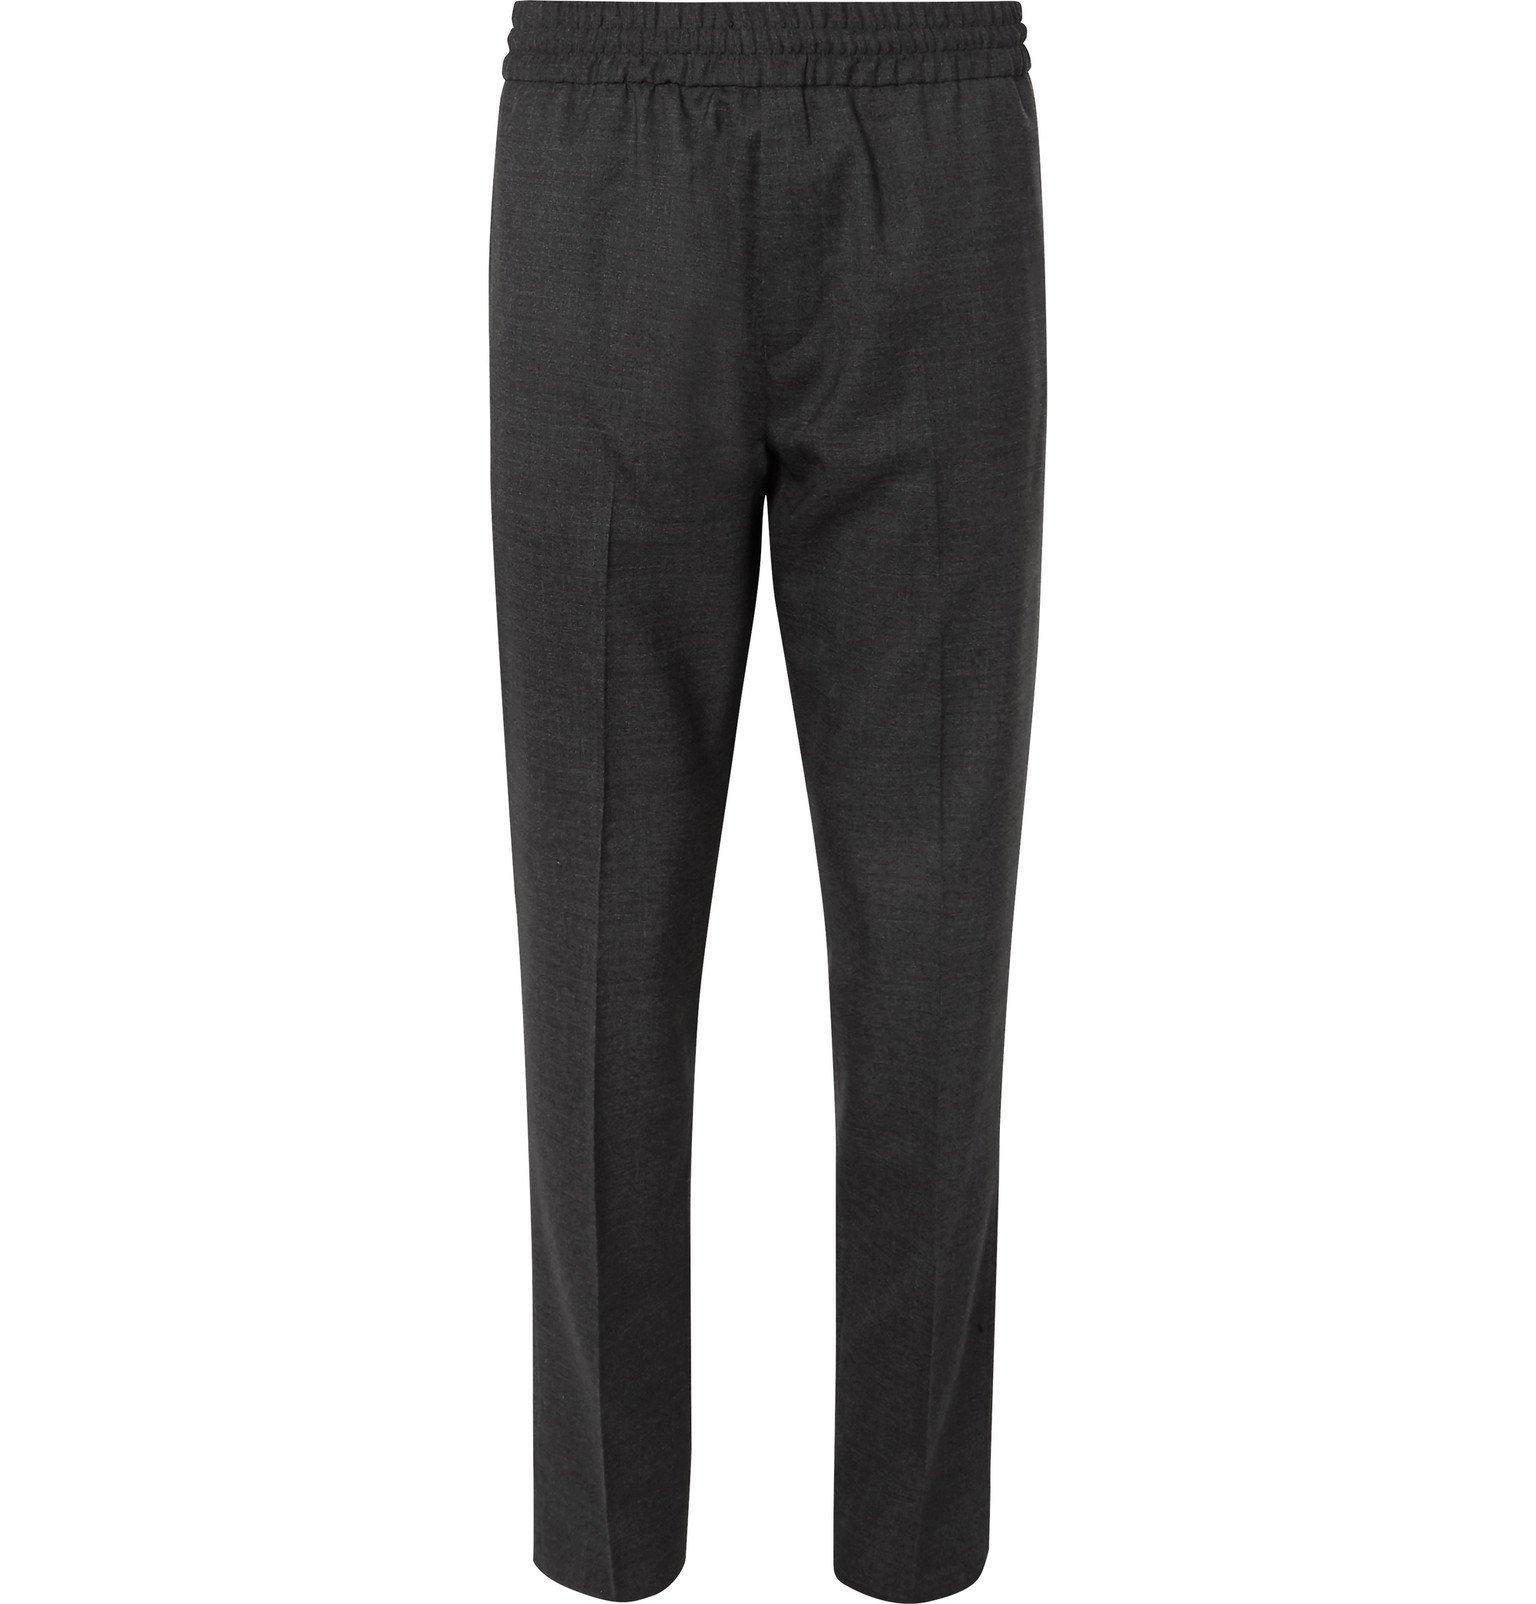 Acne Studios - Dark-Grey Ryder Wool Trousers - Gray